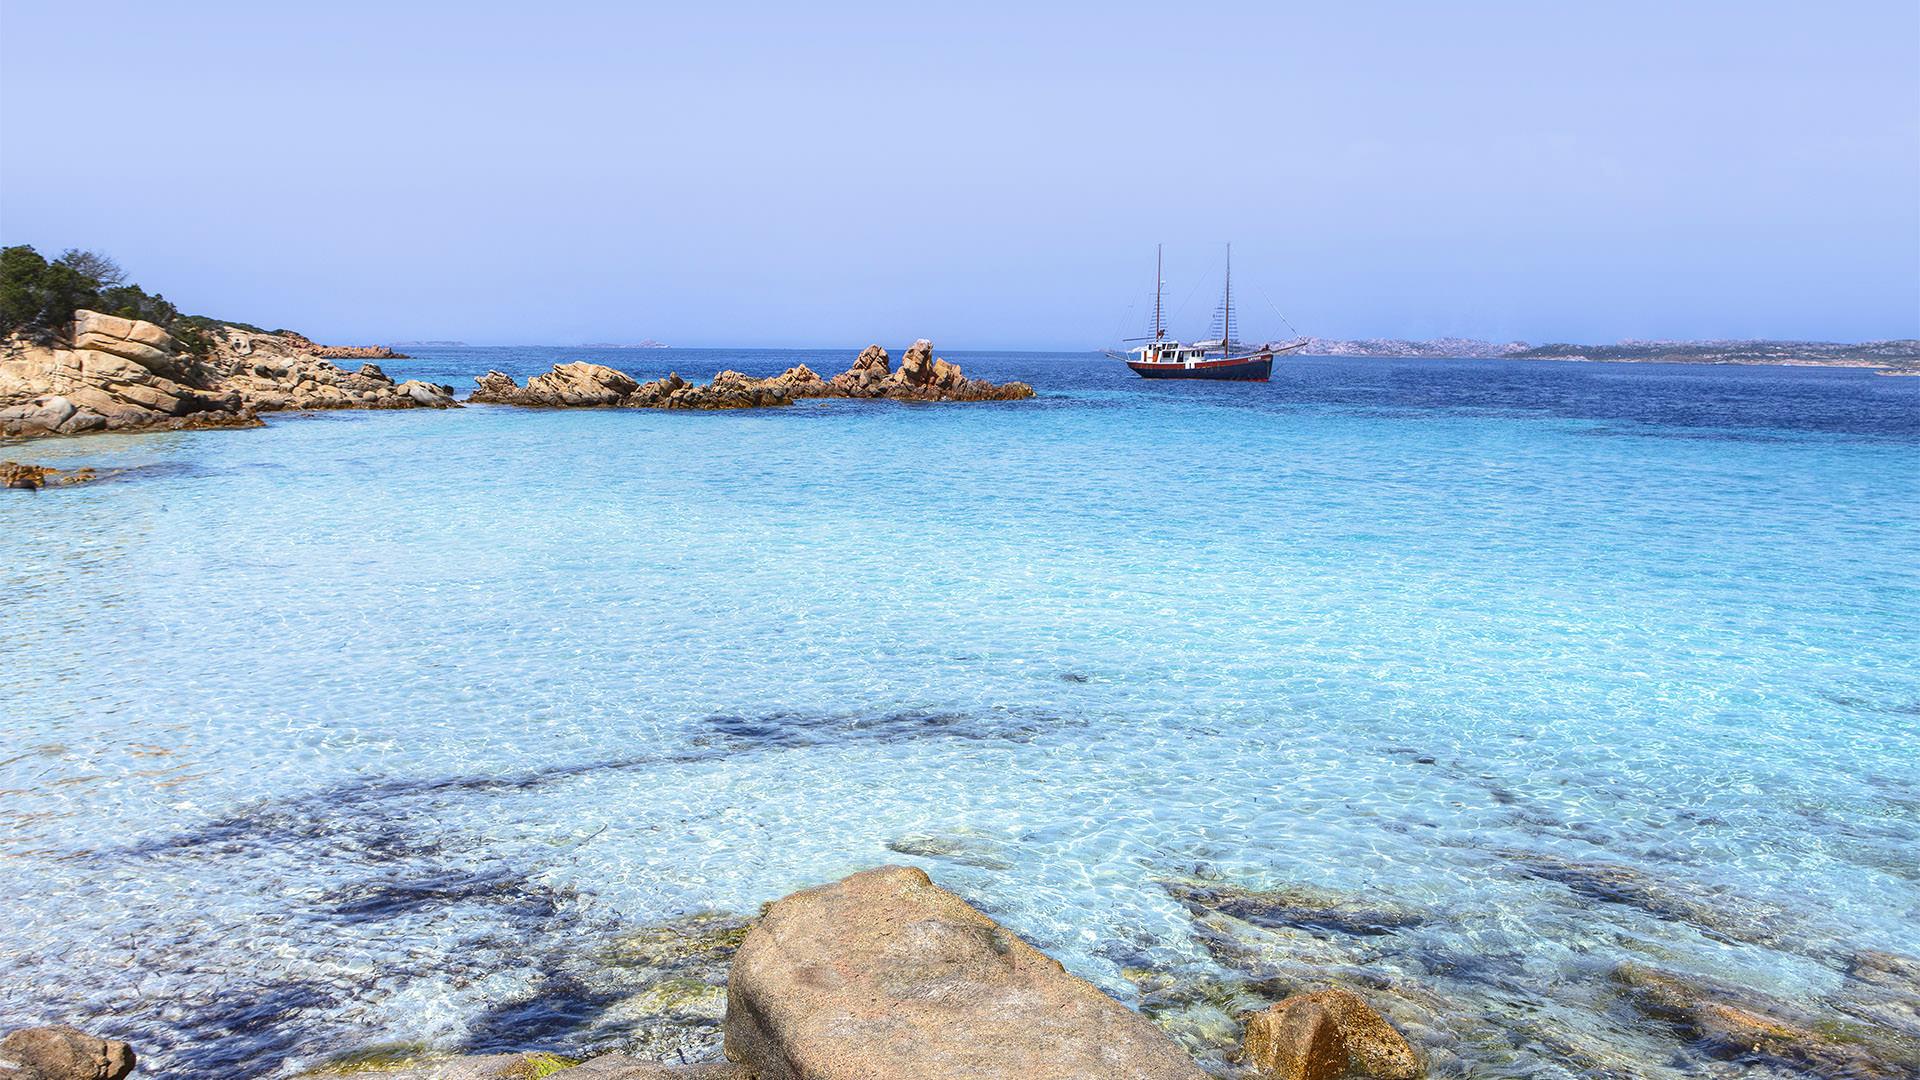 connari-arcipelago-maddalena-sardegna